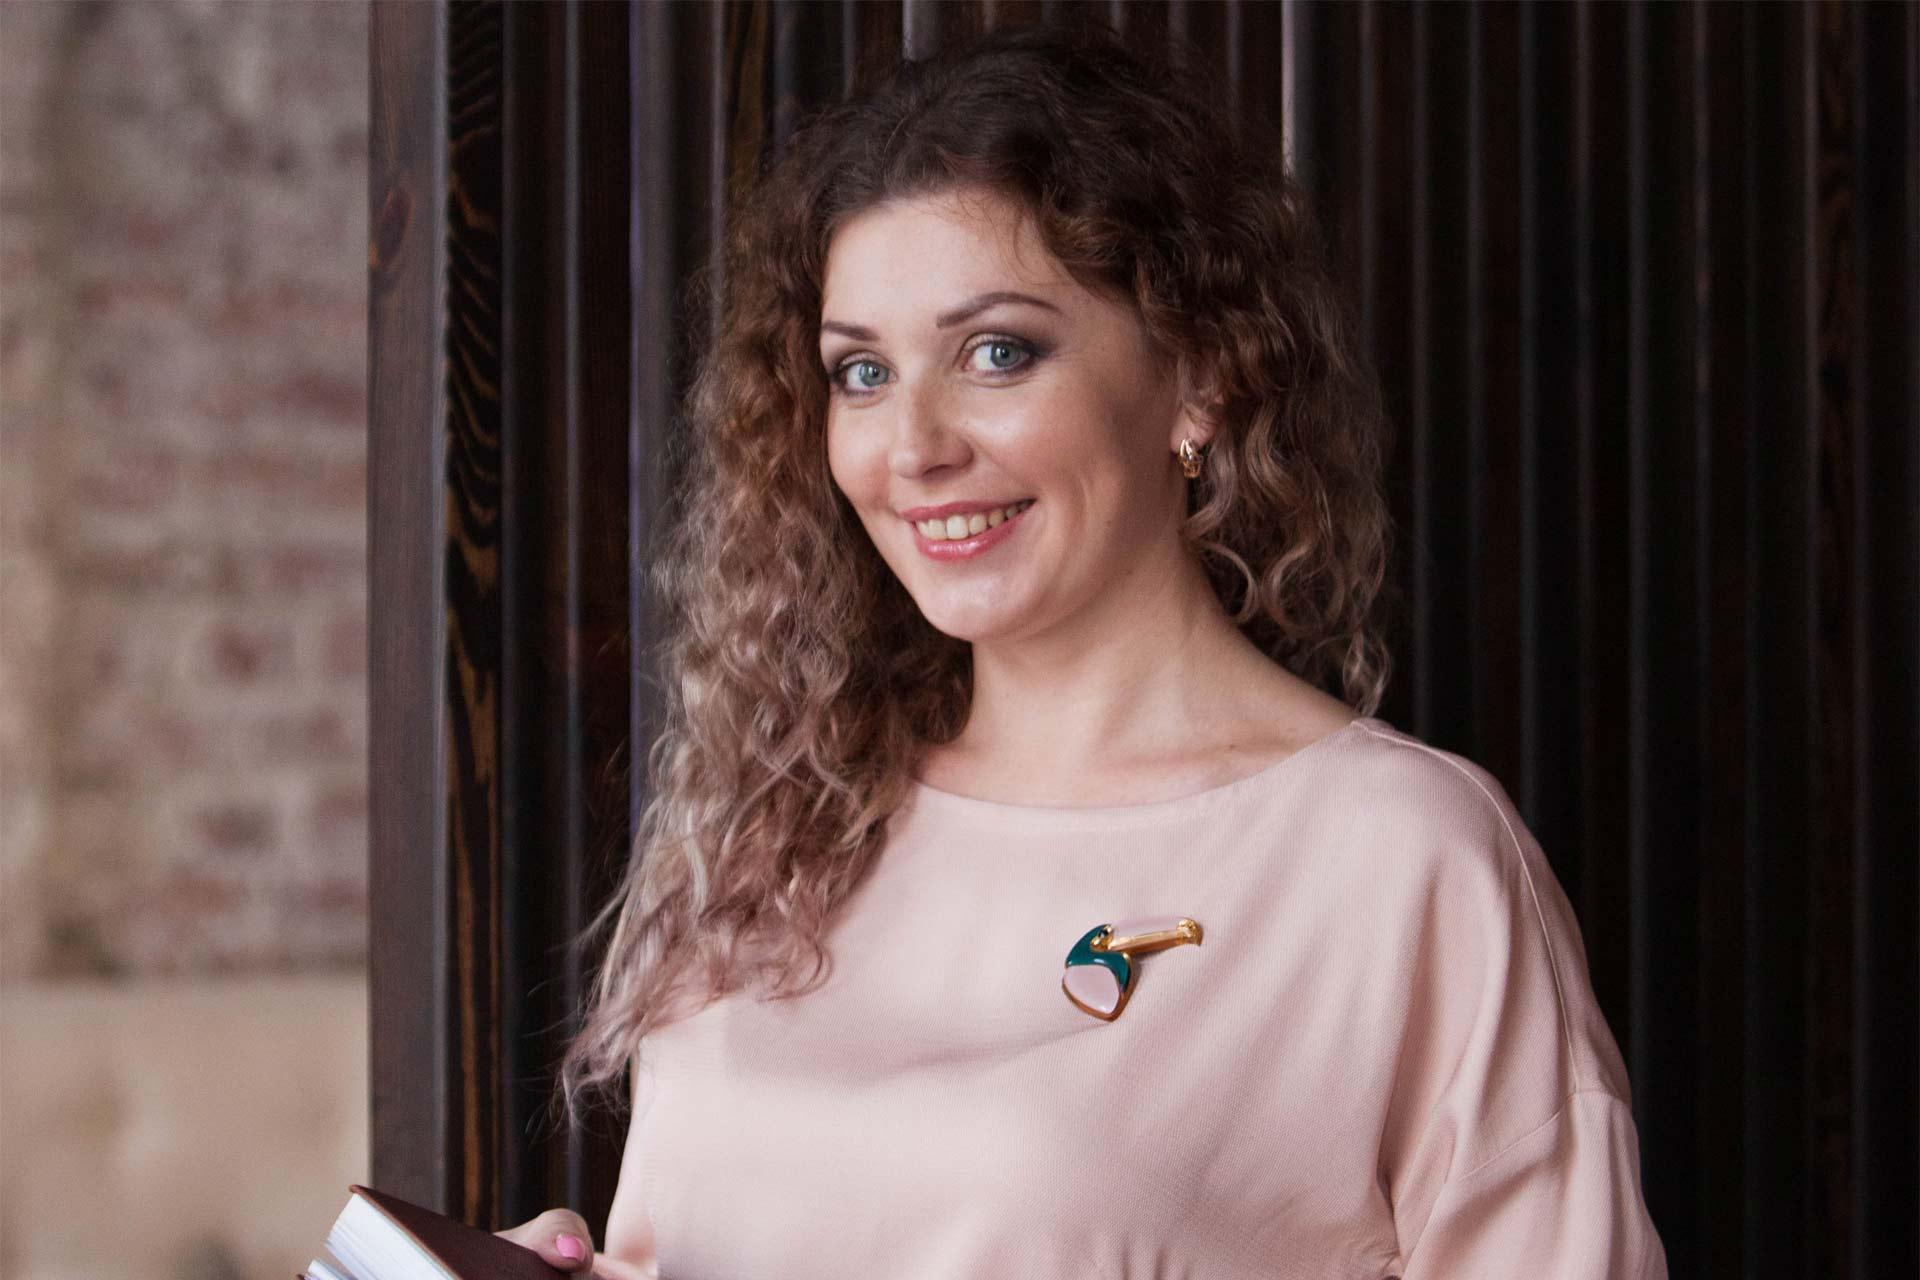 Виктория Полубан, предприниматель, спикер курсов по SMM маркетингу